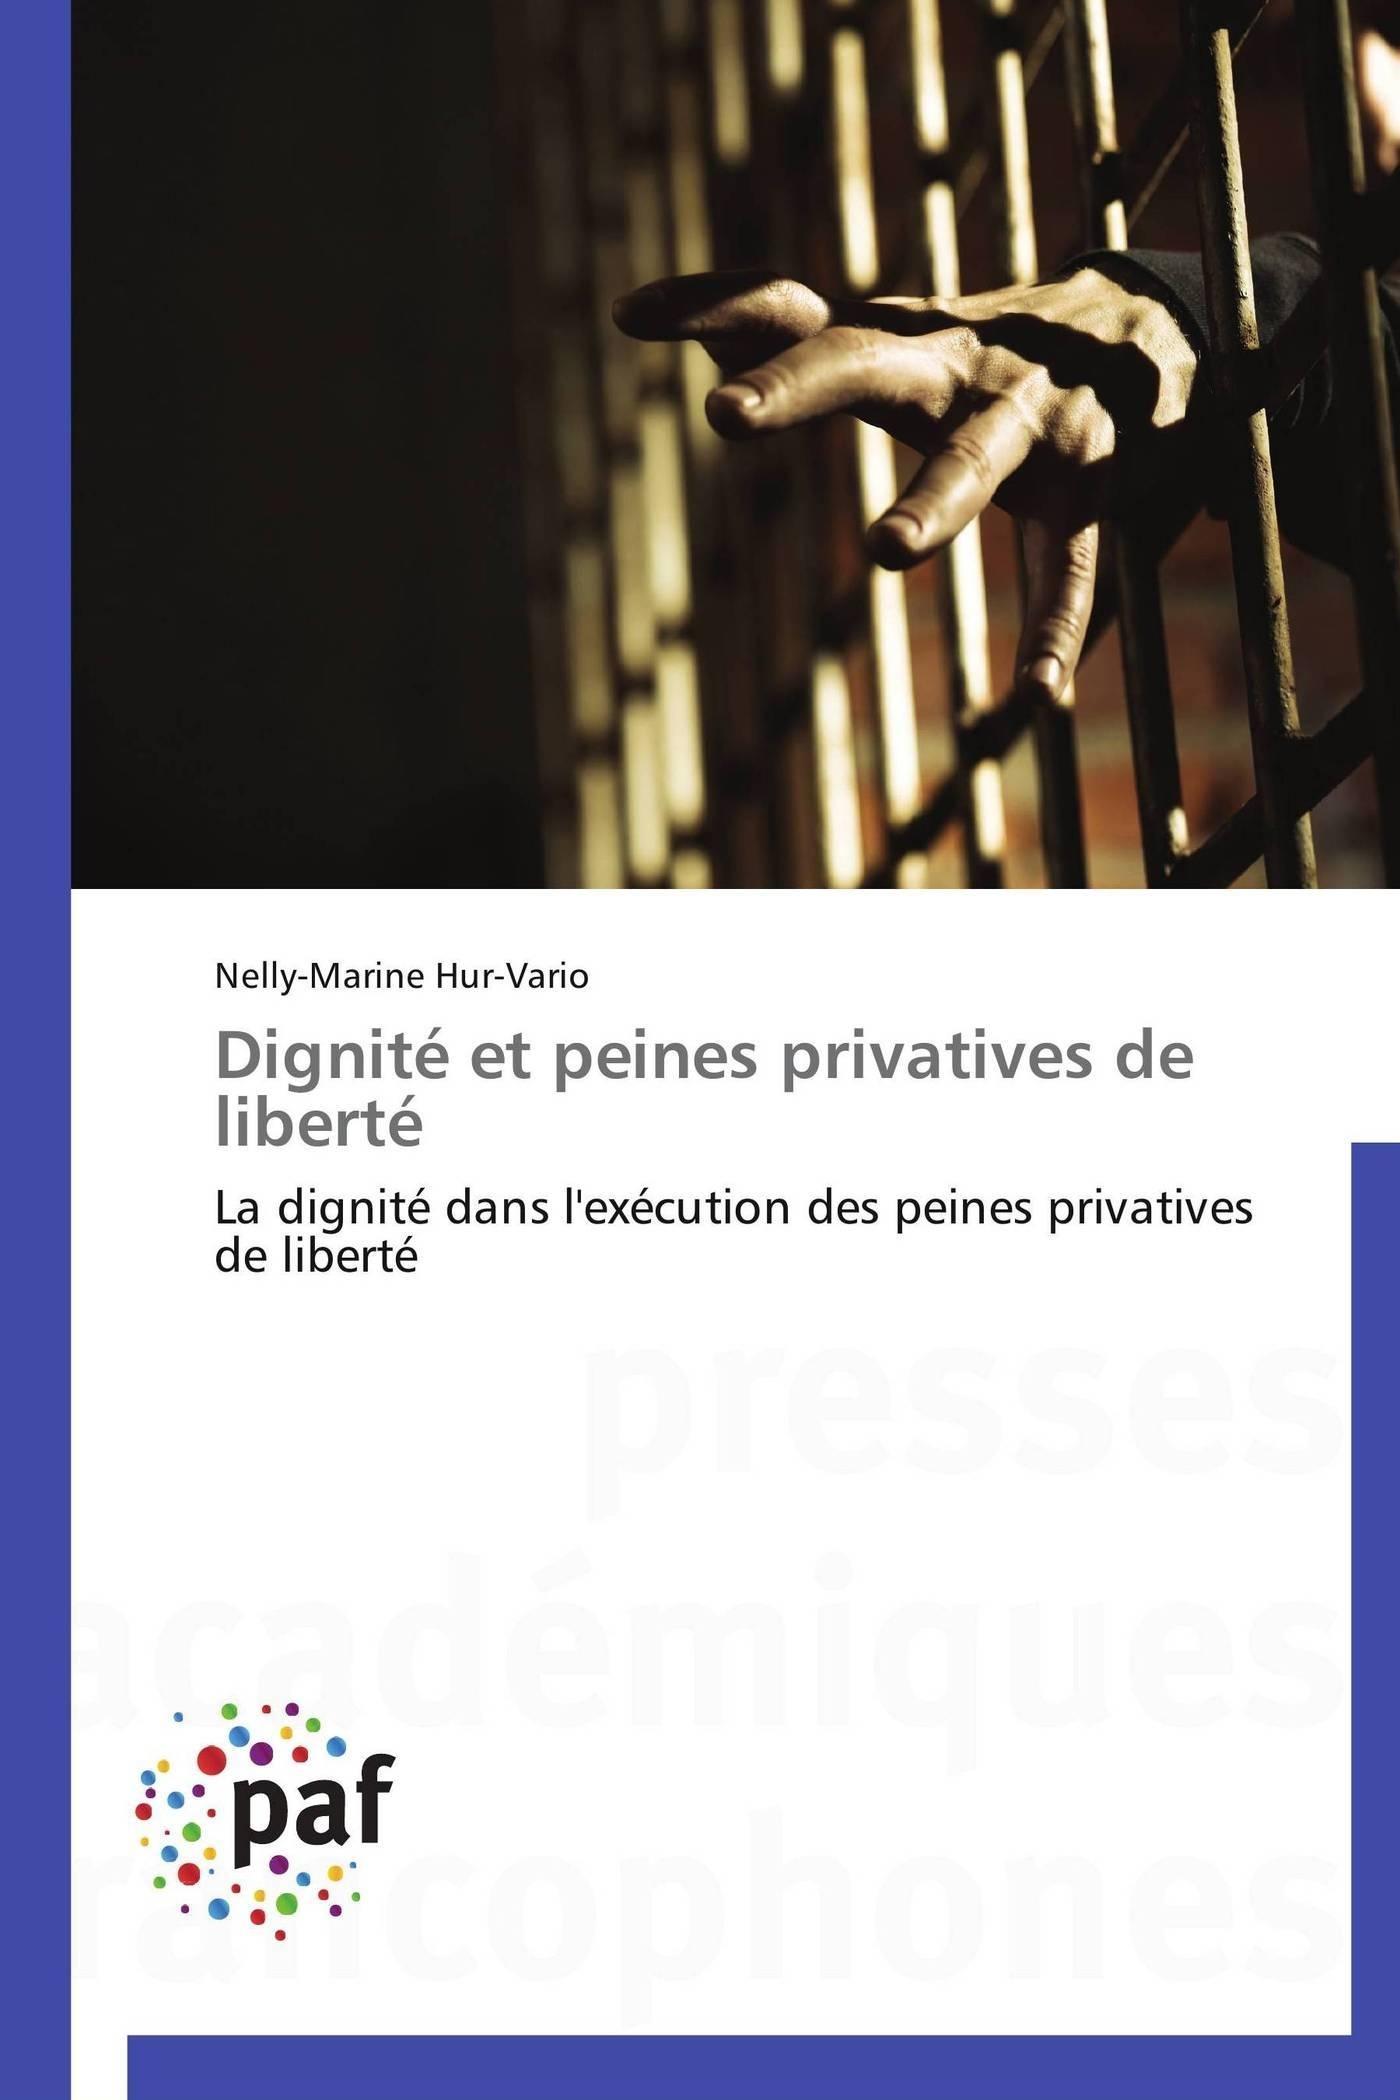 DIGNITE ET PEINES PRIVATIVES DE LIBERTE